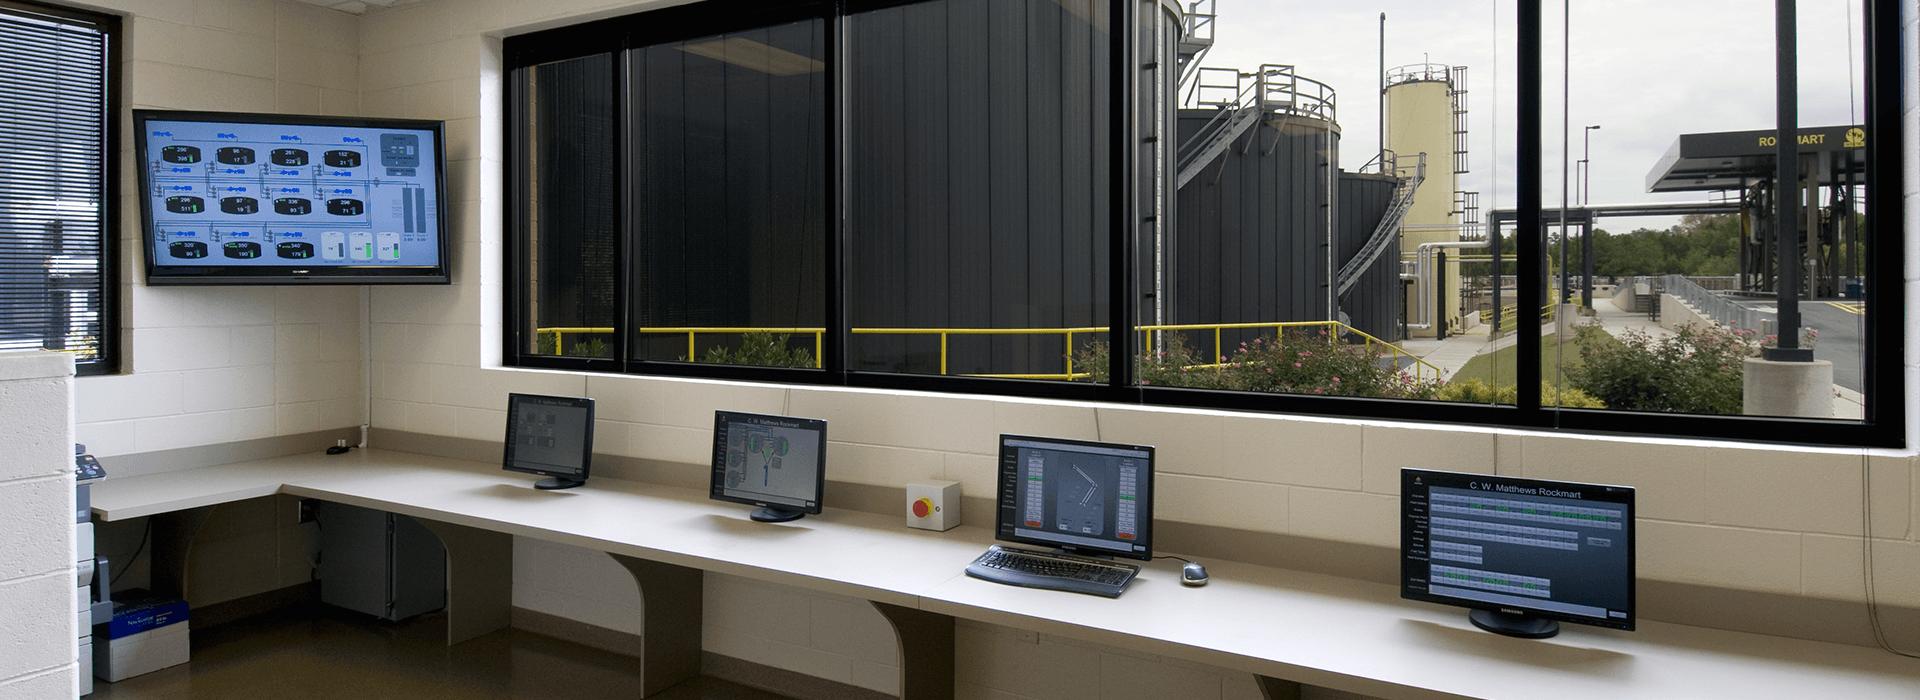 Heatec Asphalt Terminal Controls